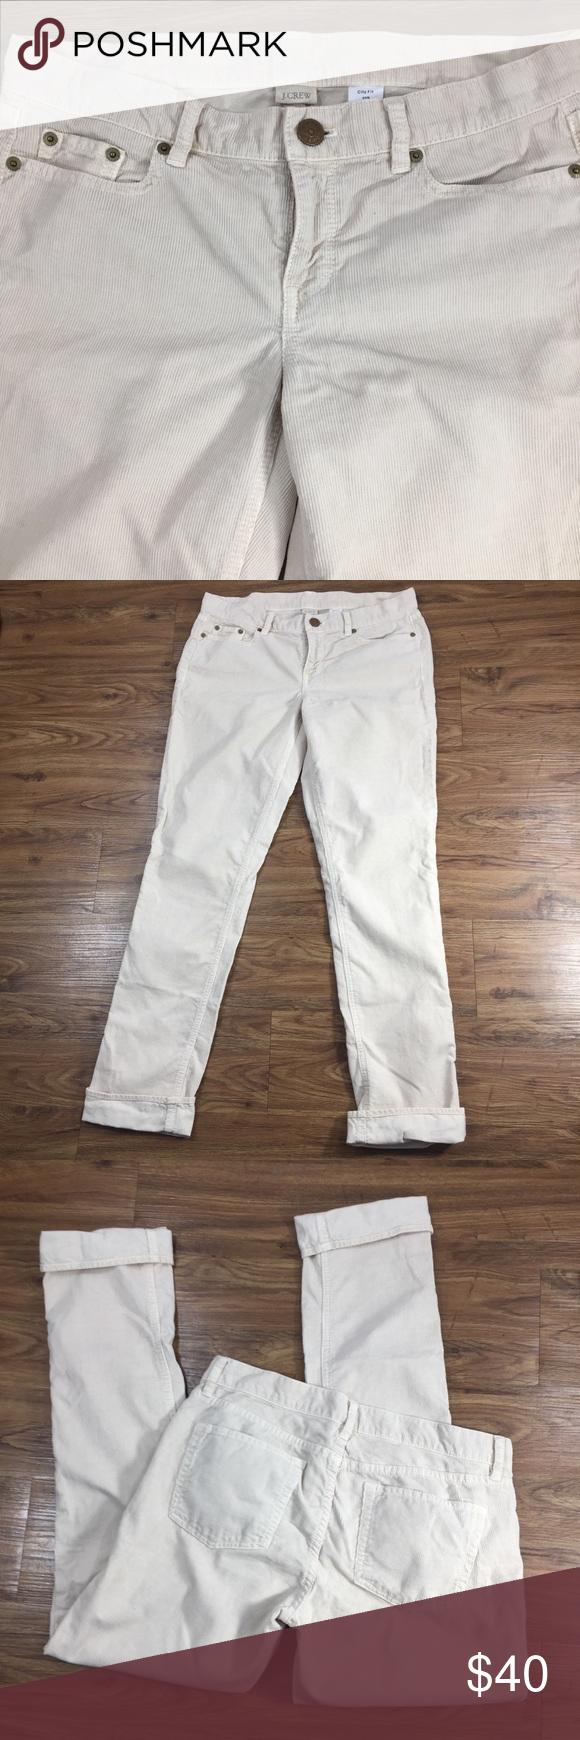 66a1b34b0653 J. Crew Cream Vintage Matchstick Corduroy Pants Skinny Leg Corduroy City Fit  28R Style # 50028 J. Crew Pants Skinny